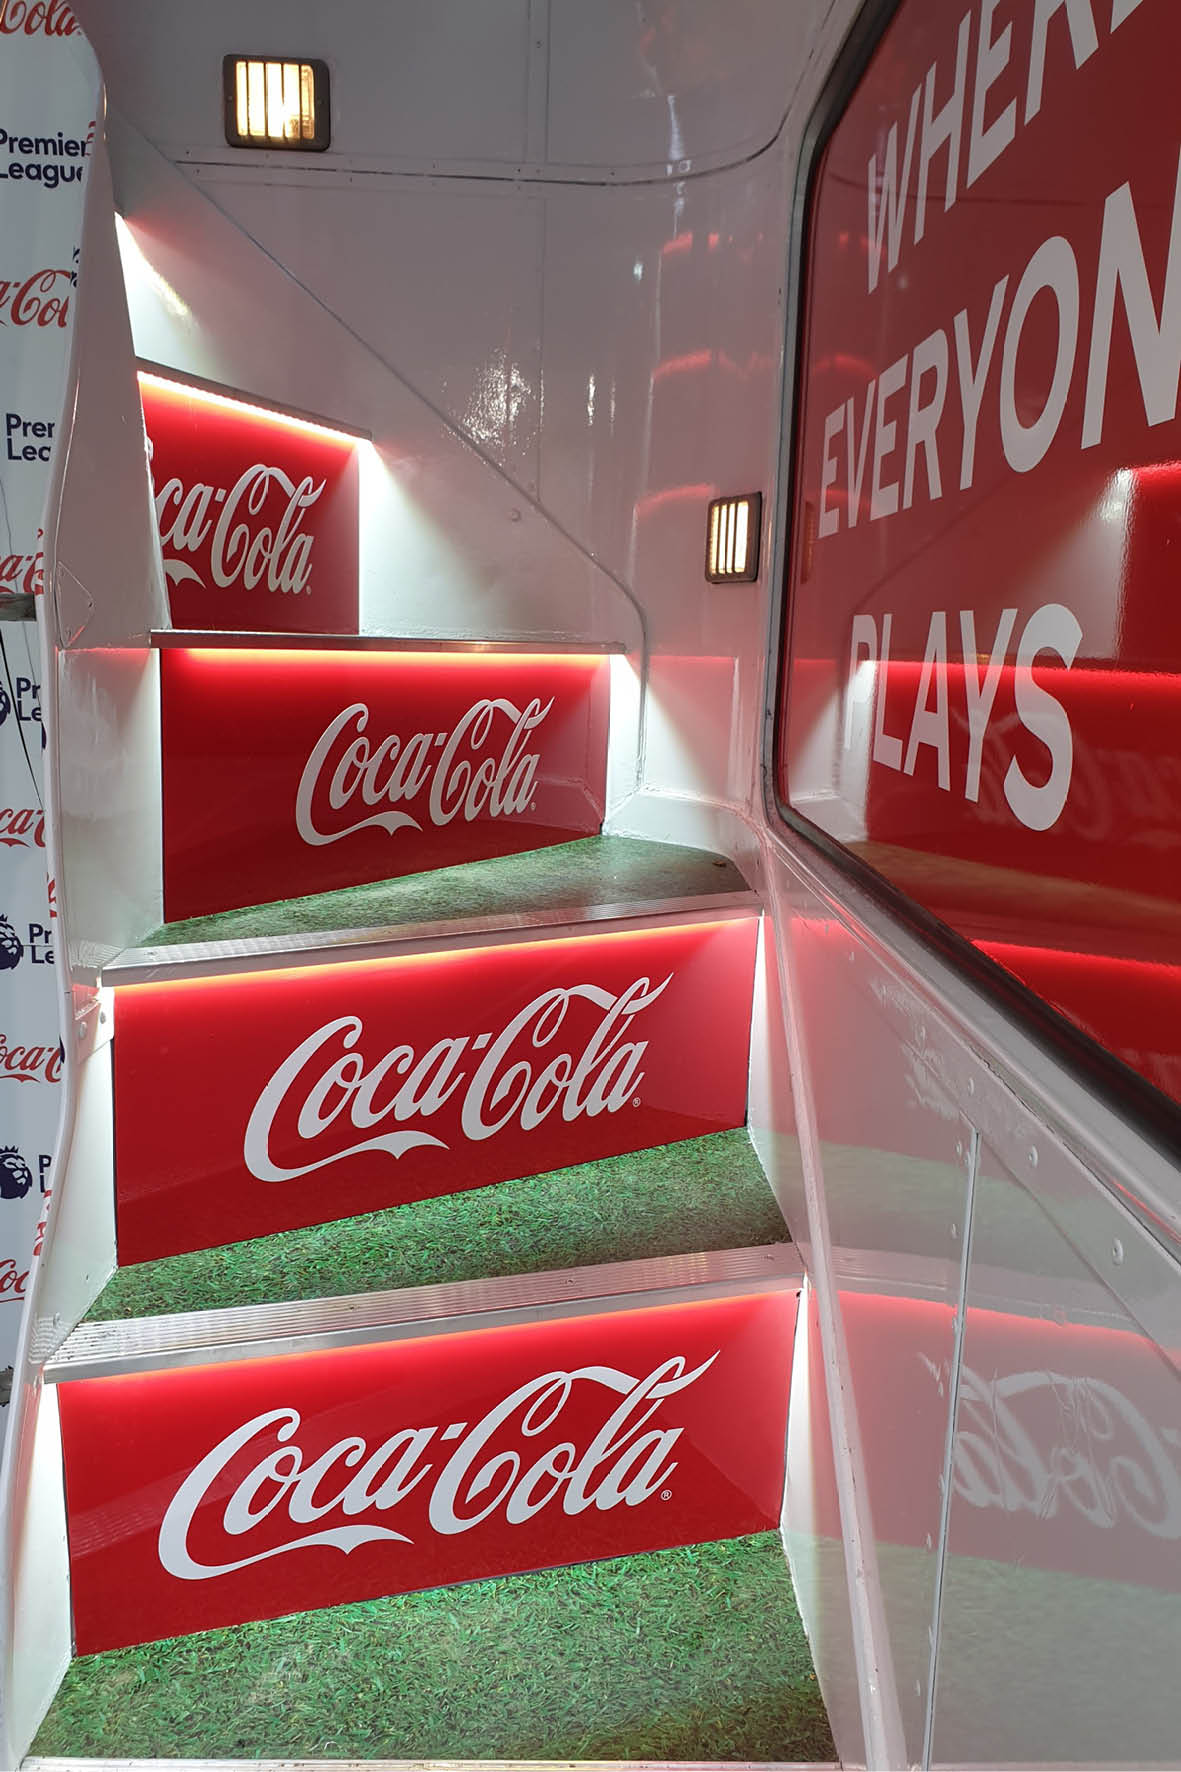 bus_business_2019p_coca_cola_2.jpg